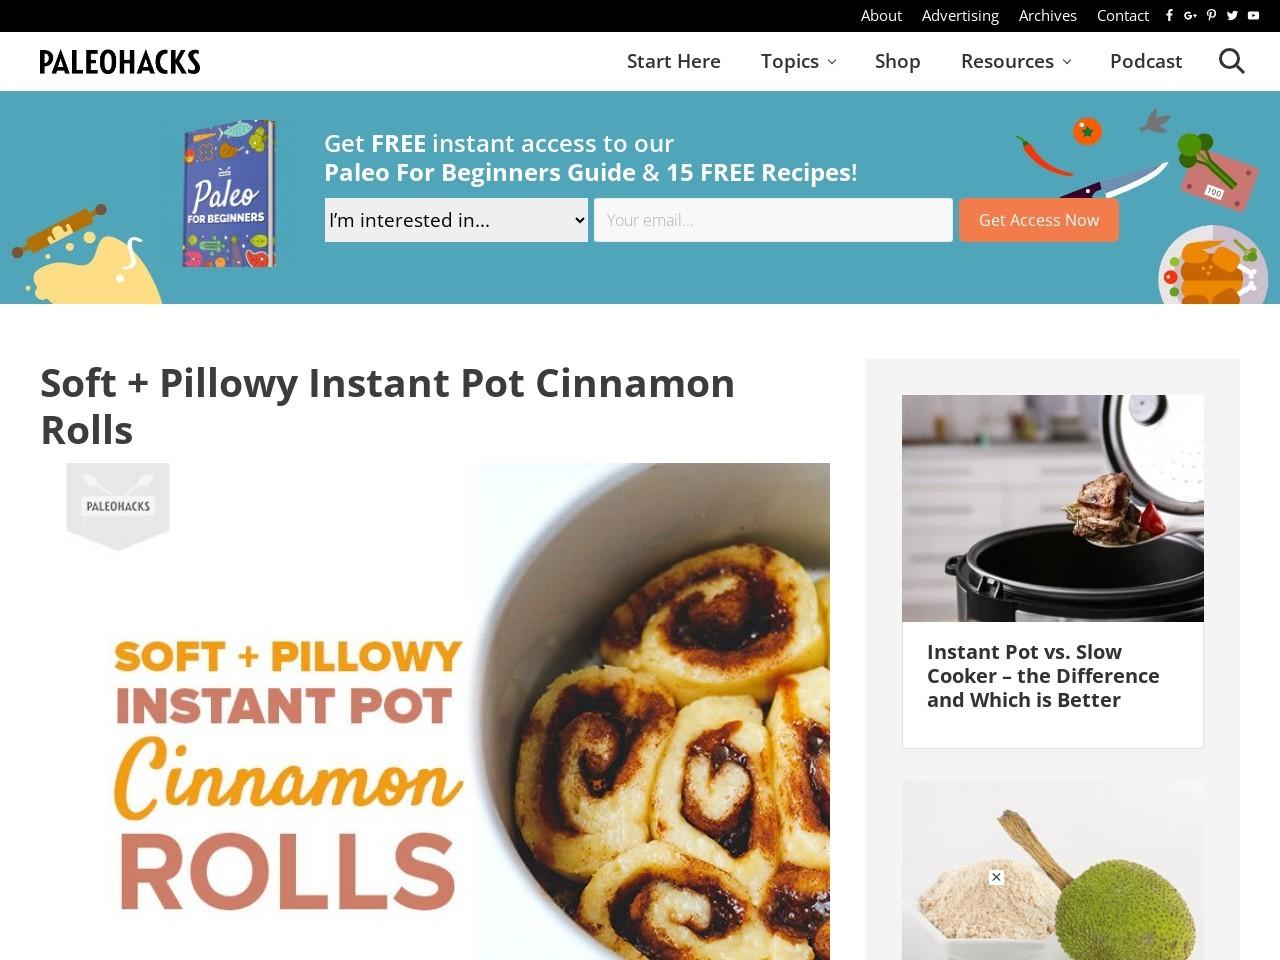 Soft + Pillowy Instant Pot Cinnamon Rolls